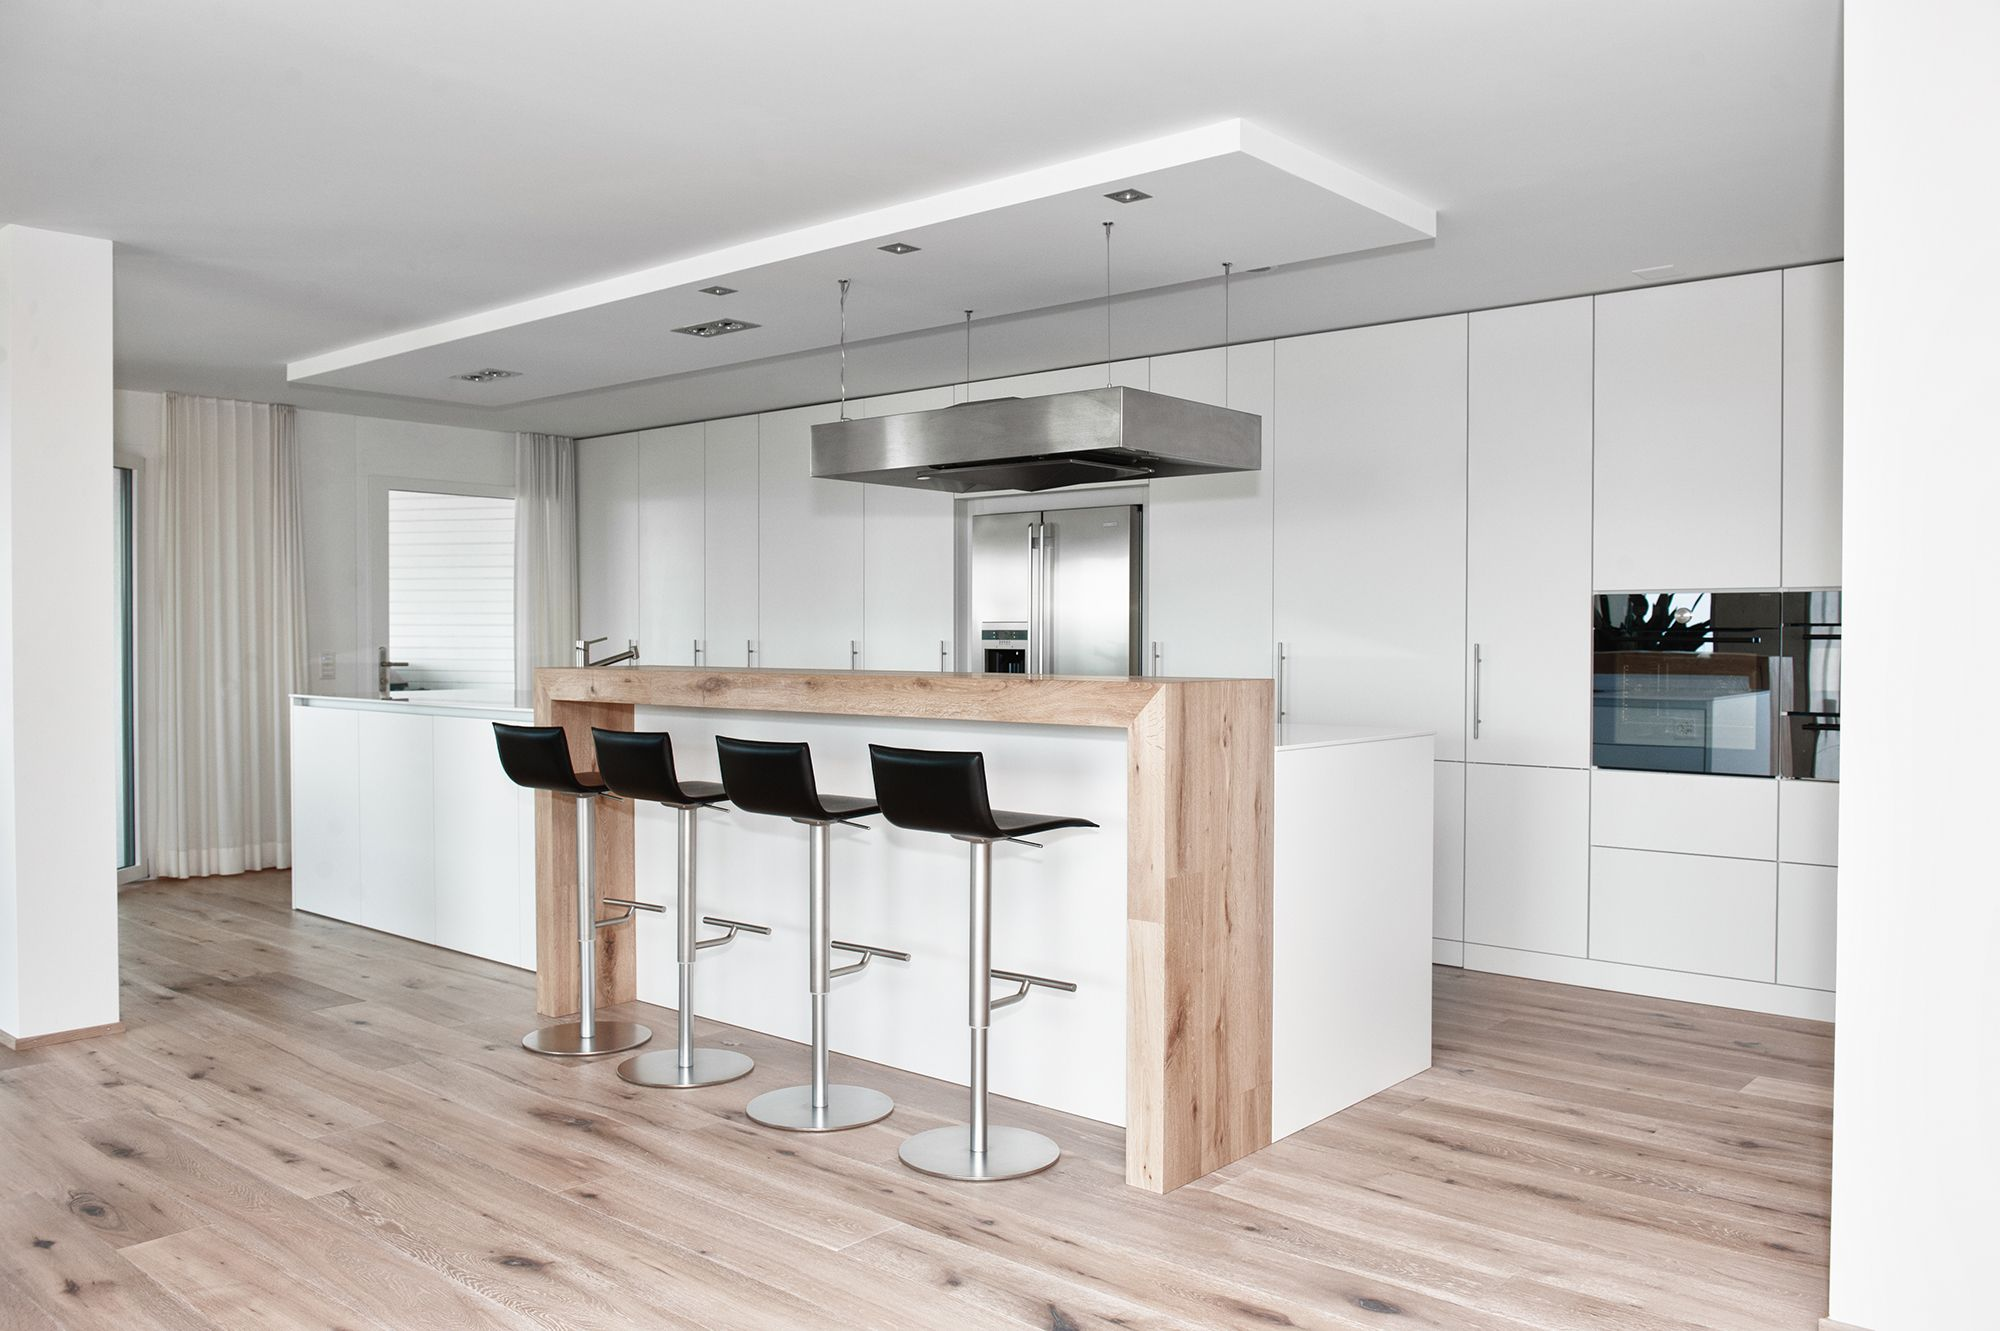 Moderne Küche Kochinsel Weiß Matt Holz Theke Kappa Armony ...